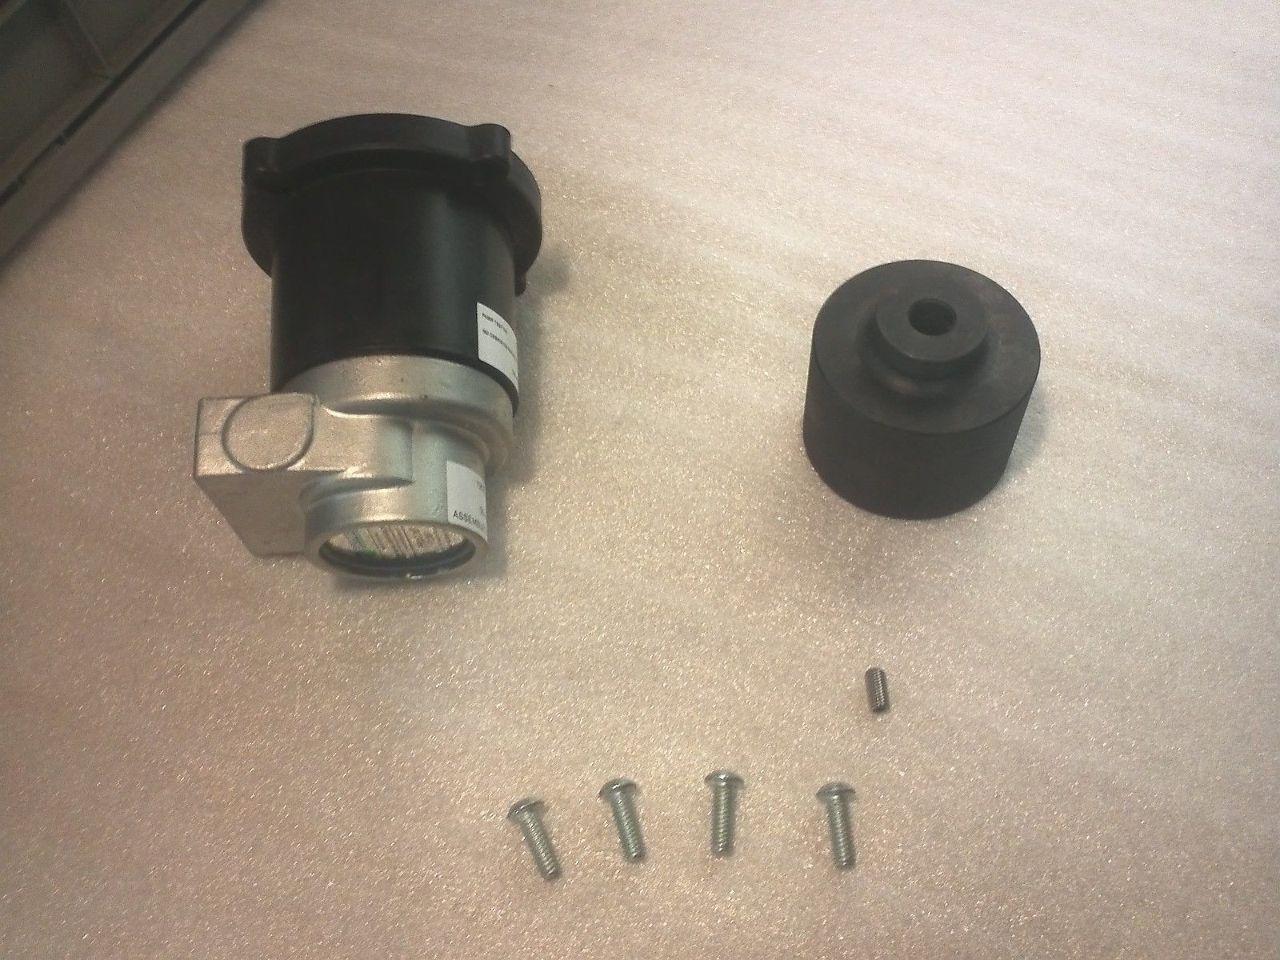 Procon Pump Saltwater Ro 254 Pump Kit S 28 3d Lotastock